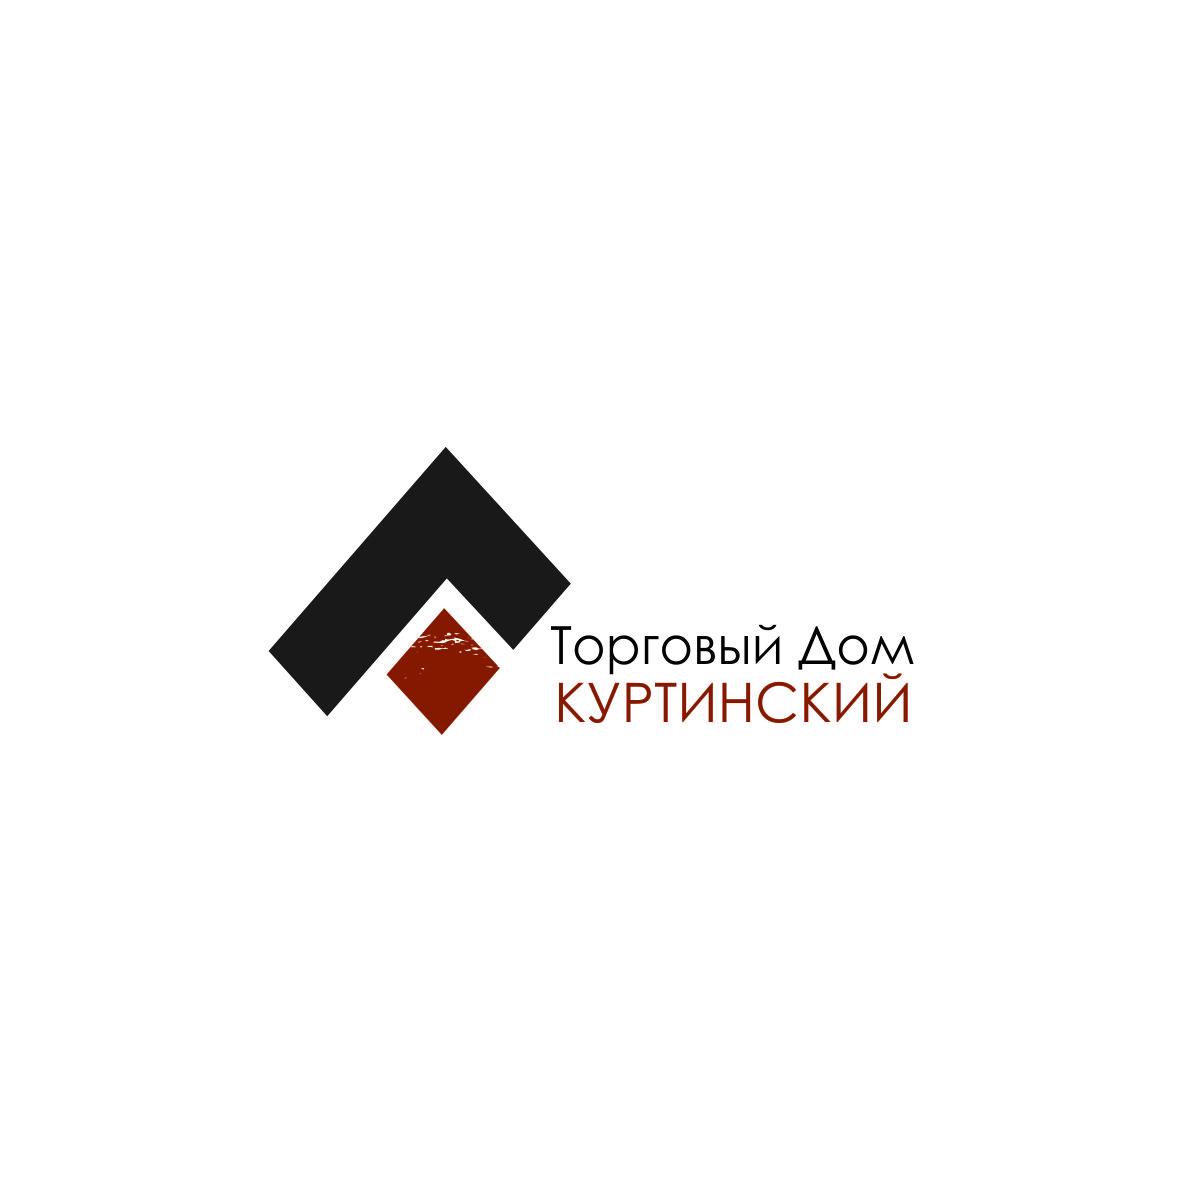 Логотип для камнедобывающей компании фото f_9135b99bf442f687.jpg